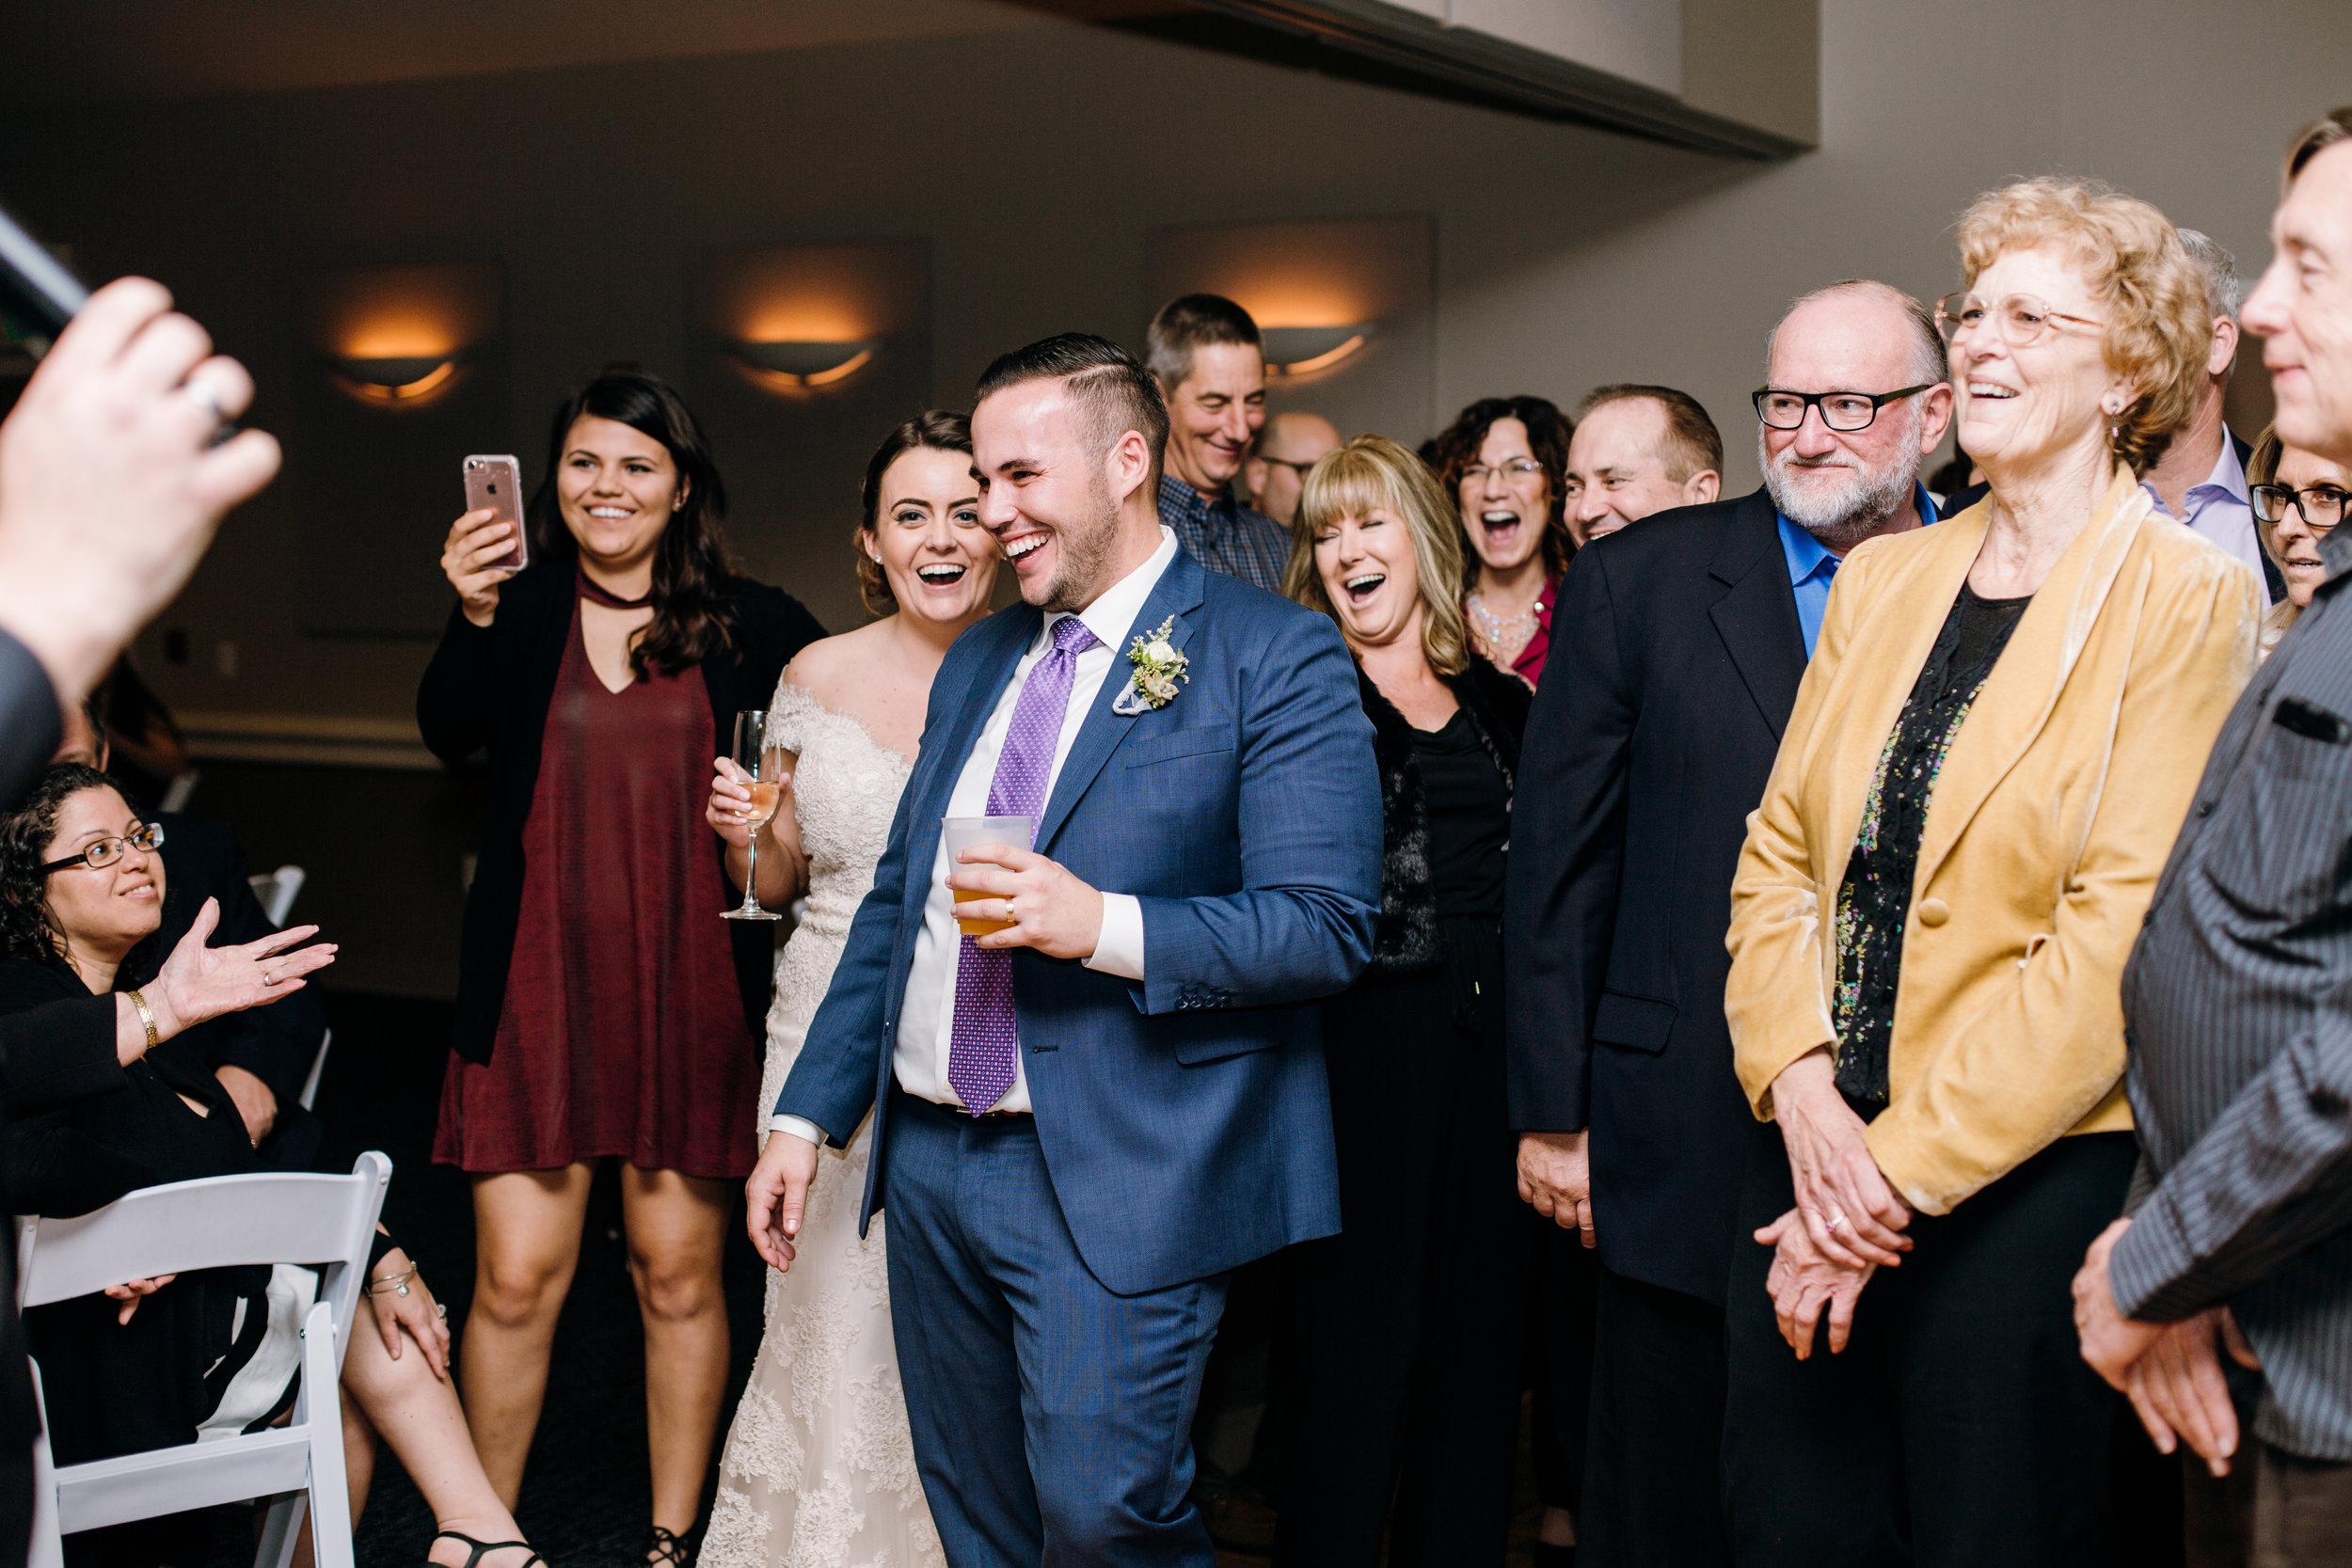 KaraNixonWeddings-DanaPoint-Wedding-49.jpg